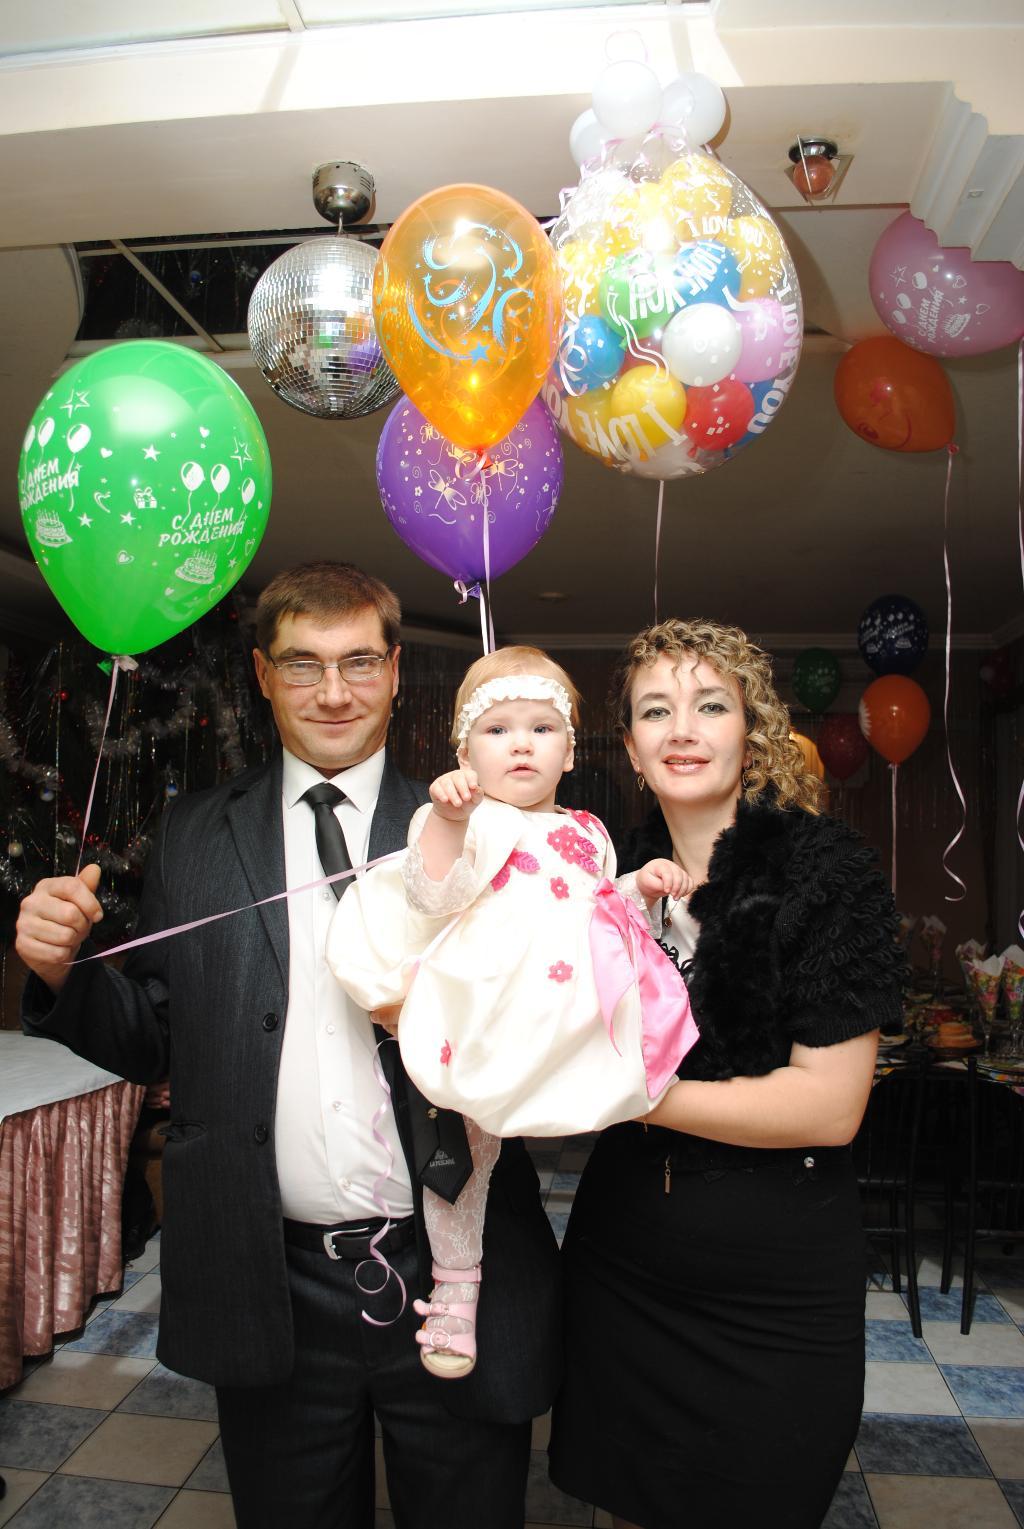 Наша доченька Настасья!!!. Мама, папа, я - счастливая семья!